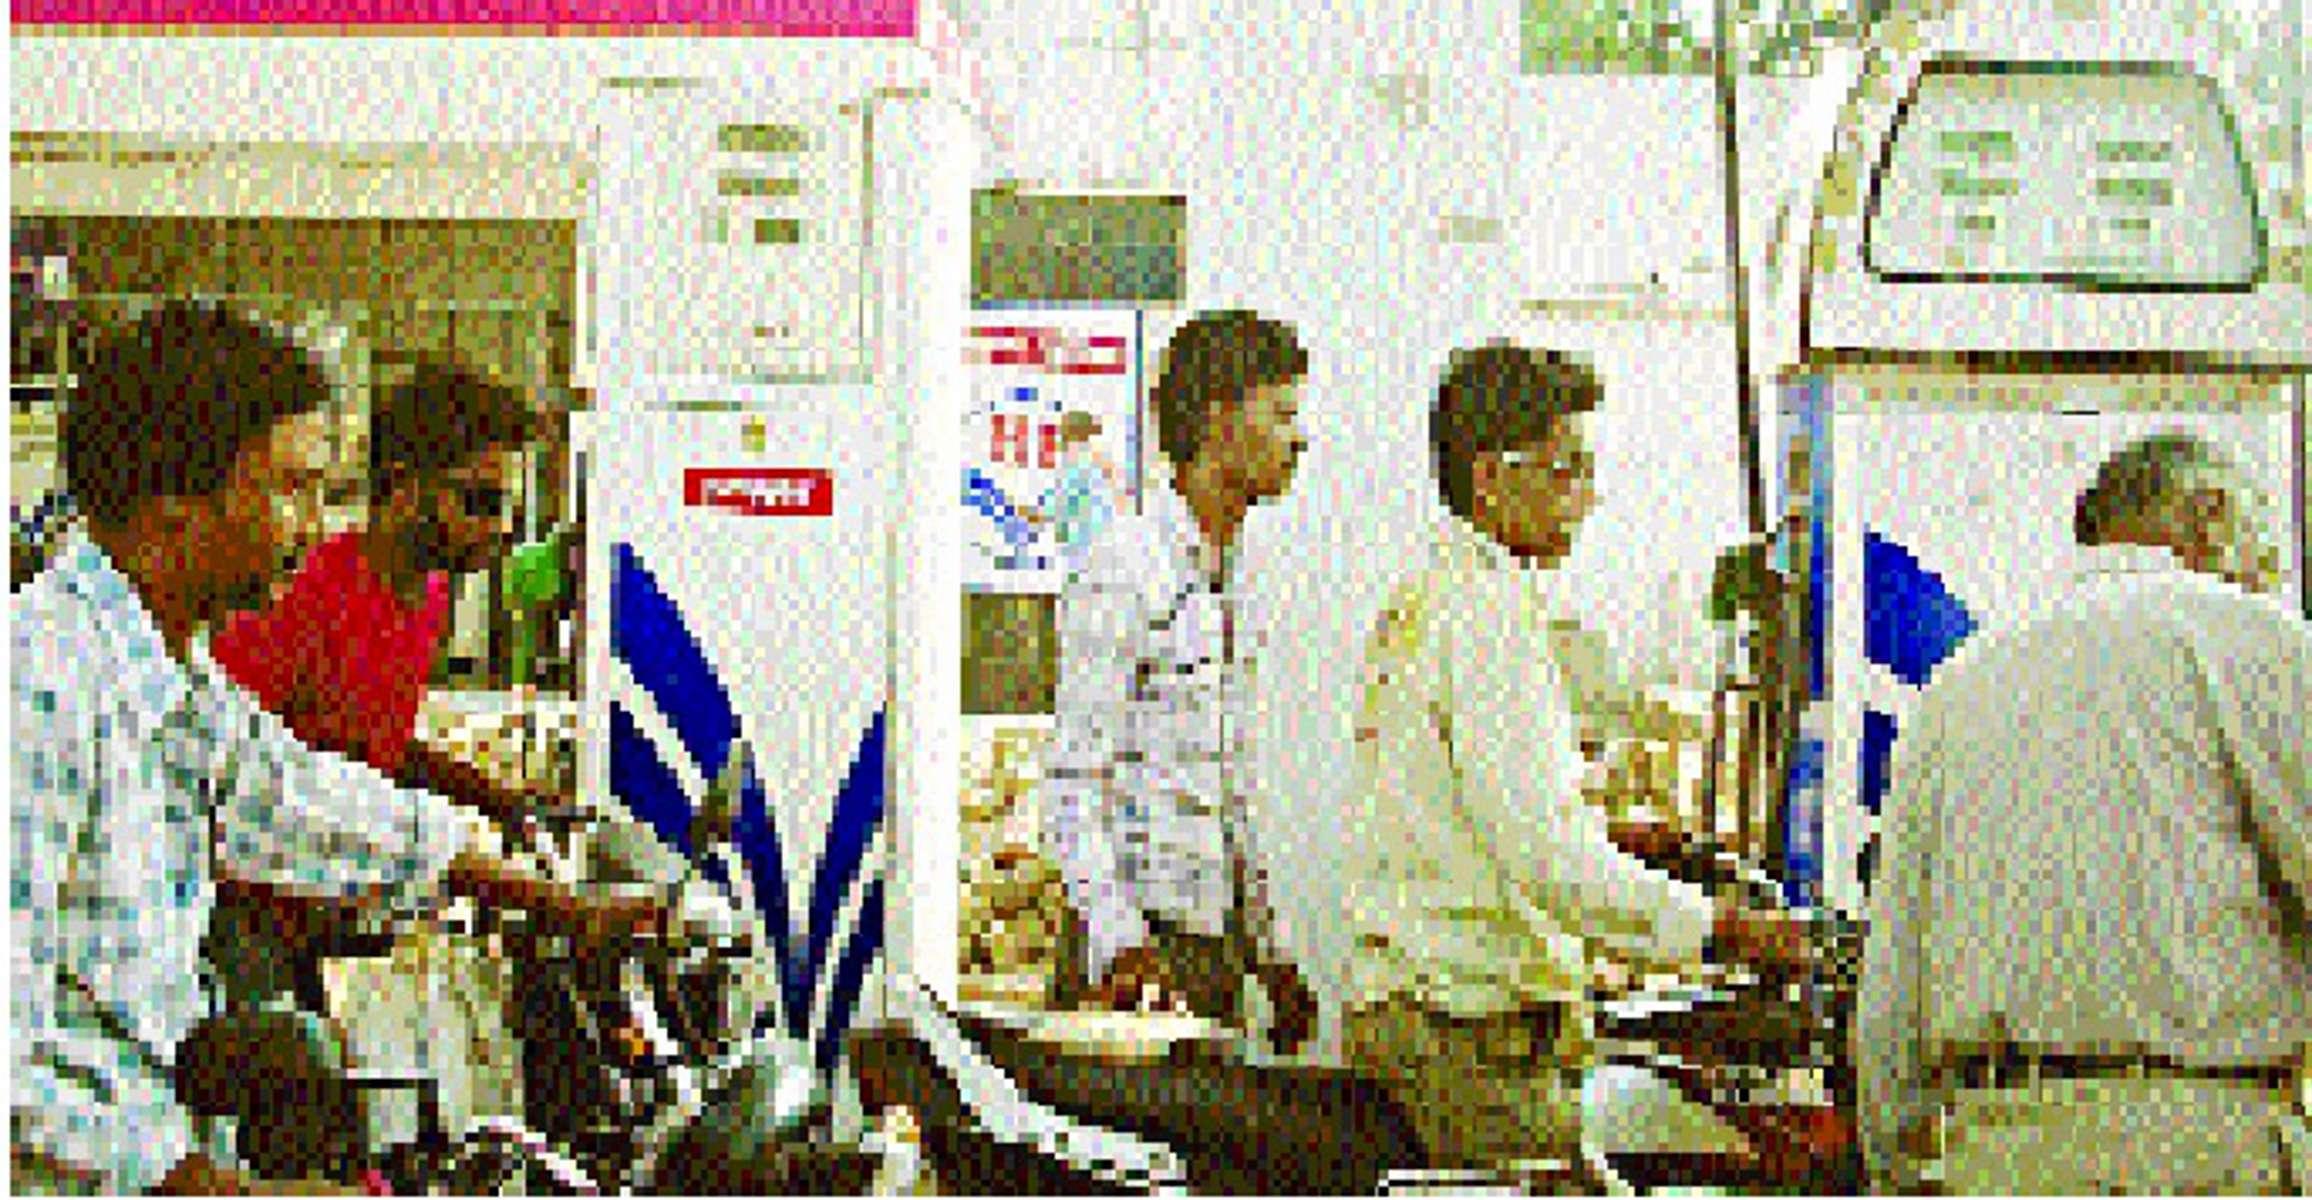 petrol pump panna